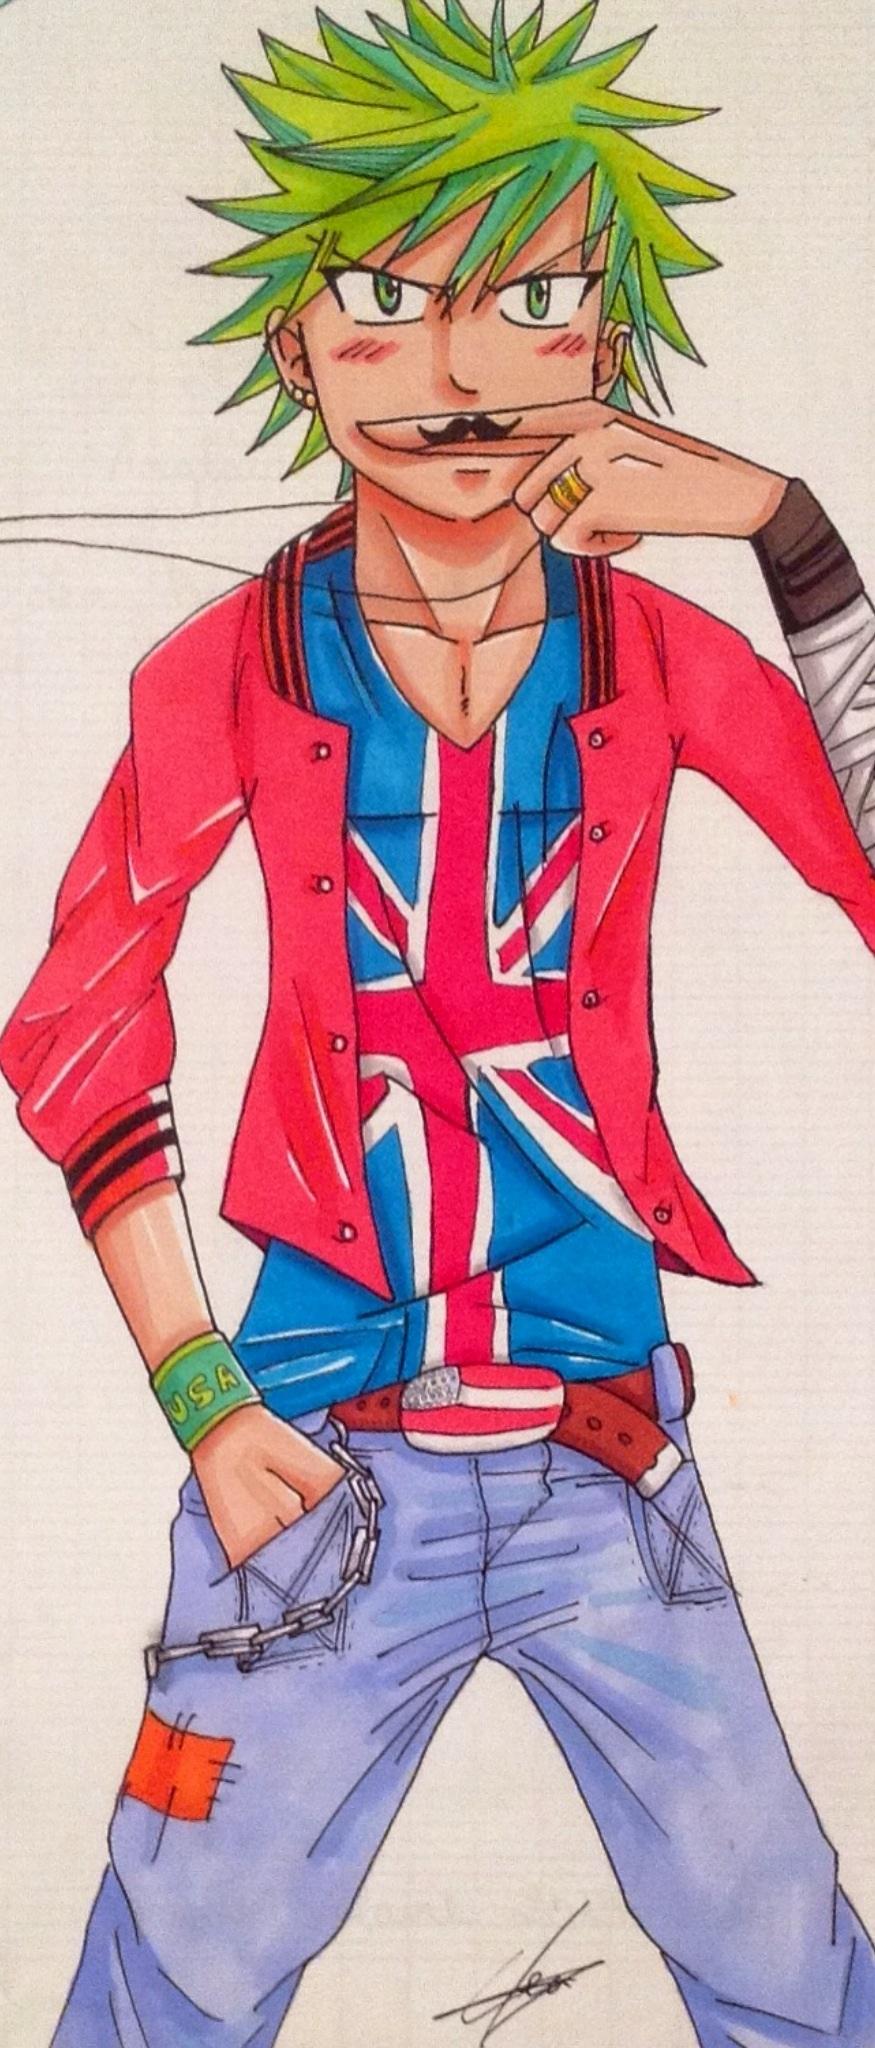 Manga swag by leadream10 on deviantart - Image manga swag ...